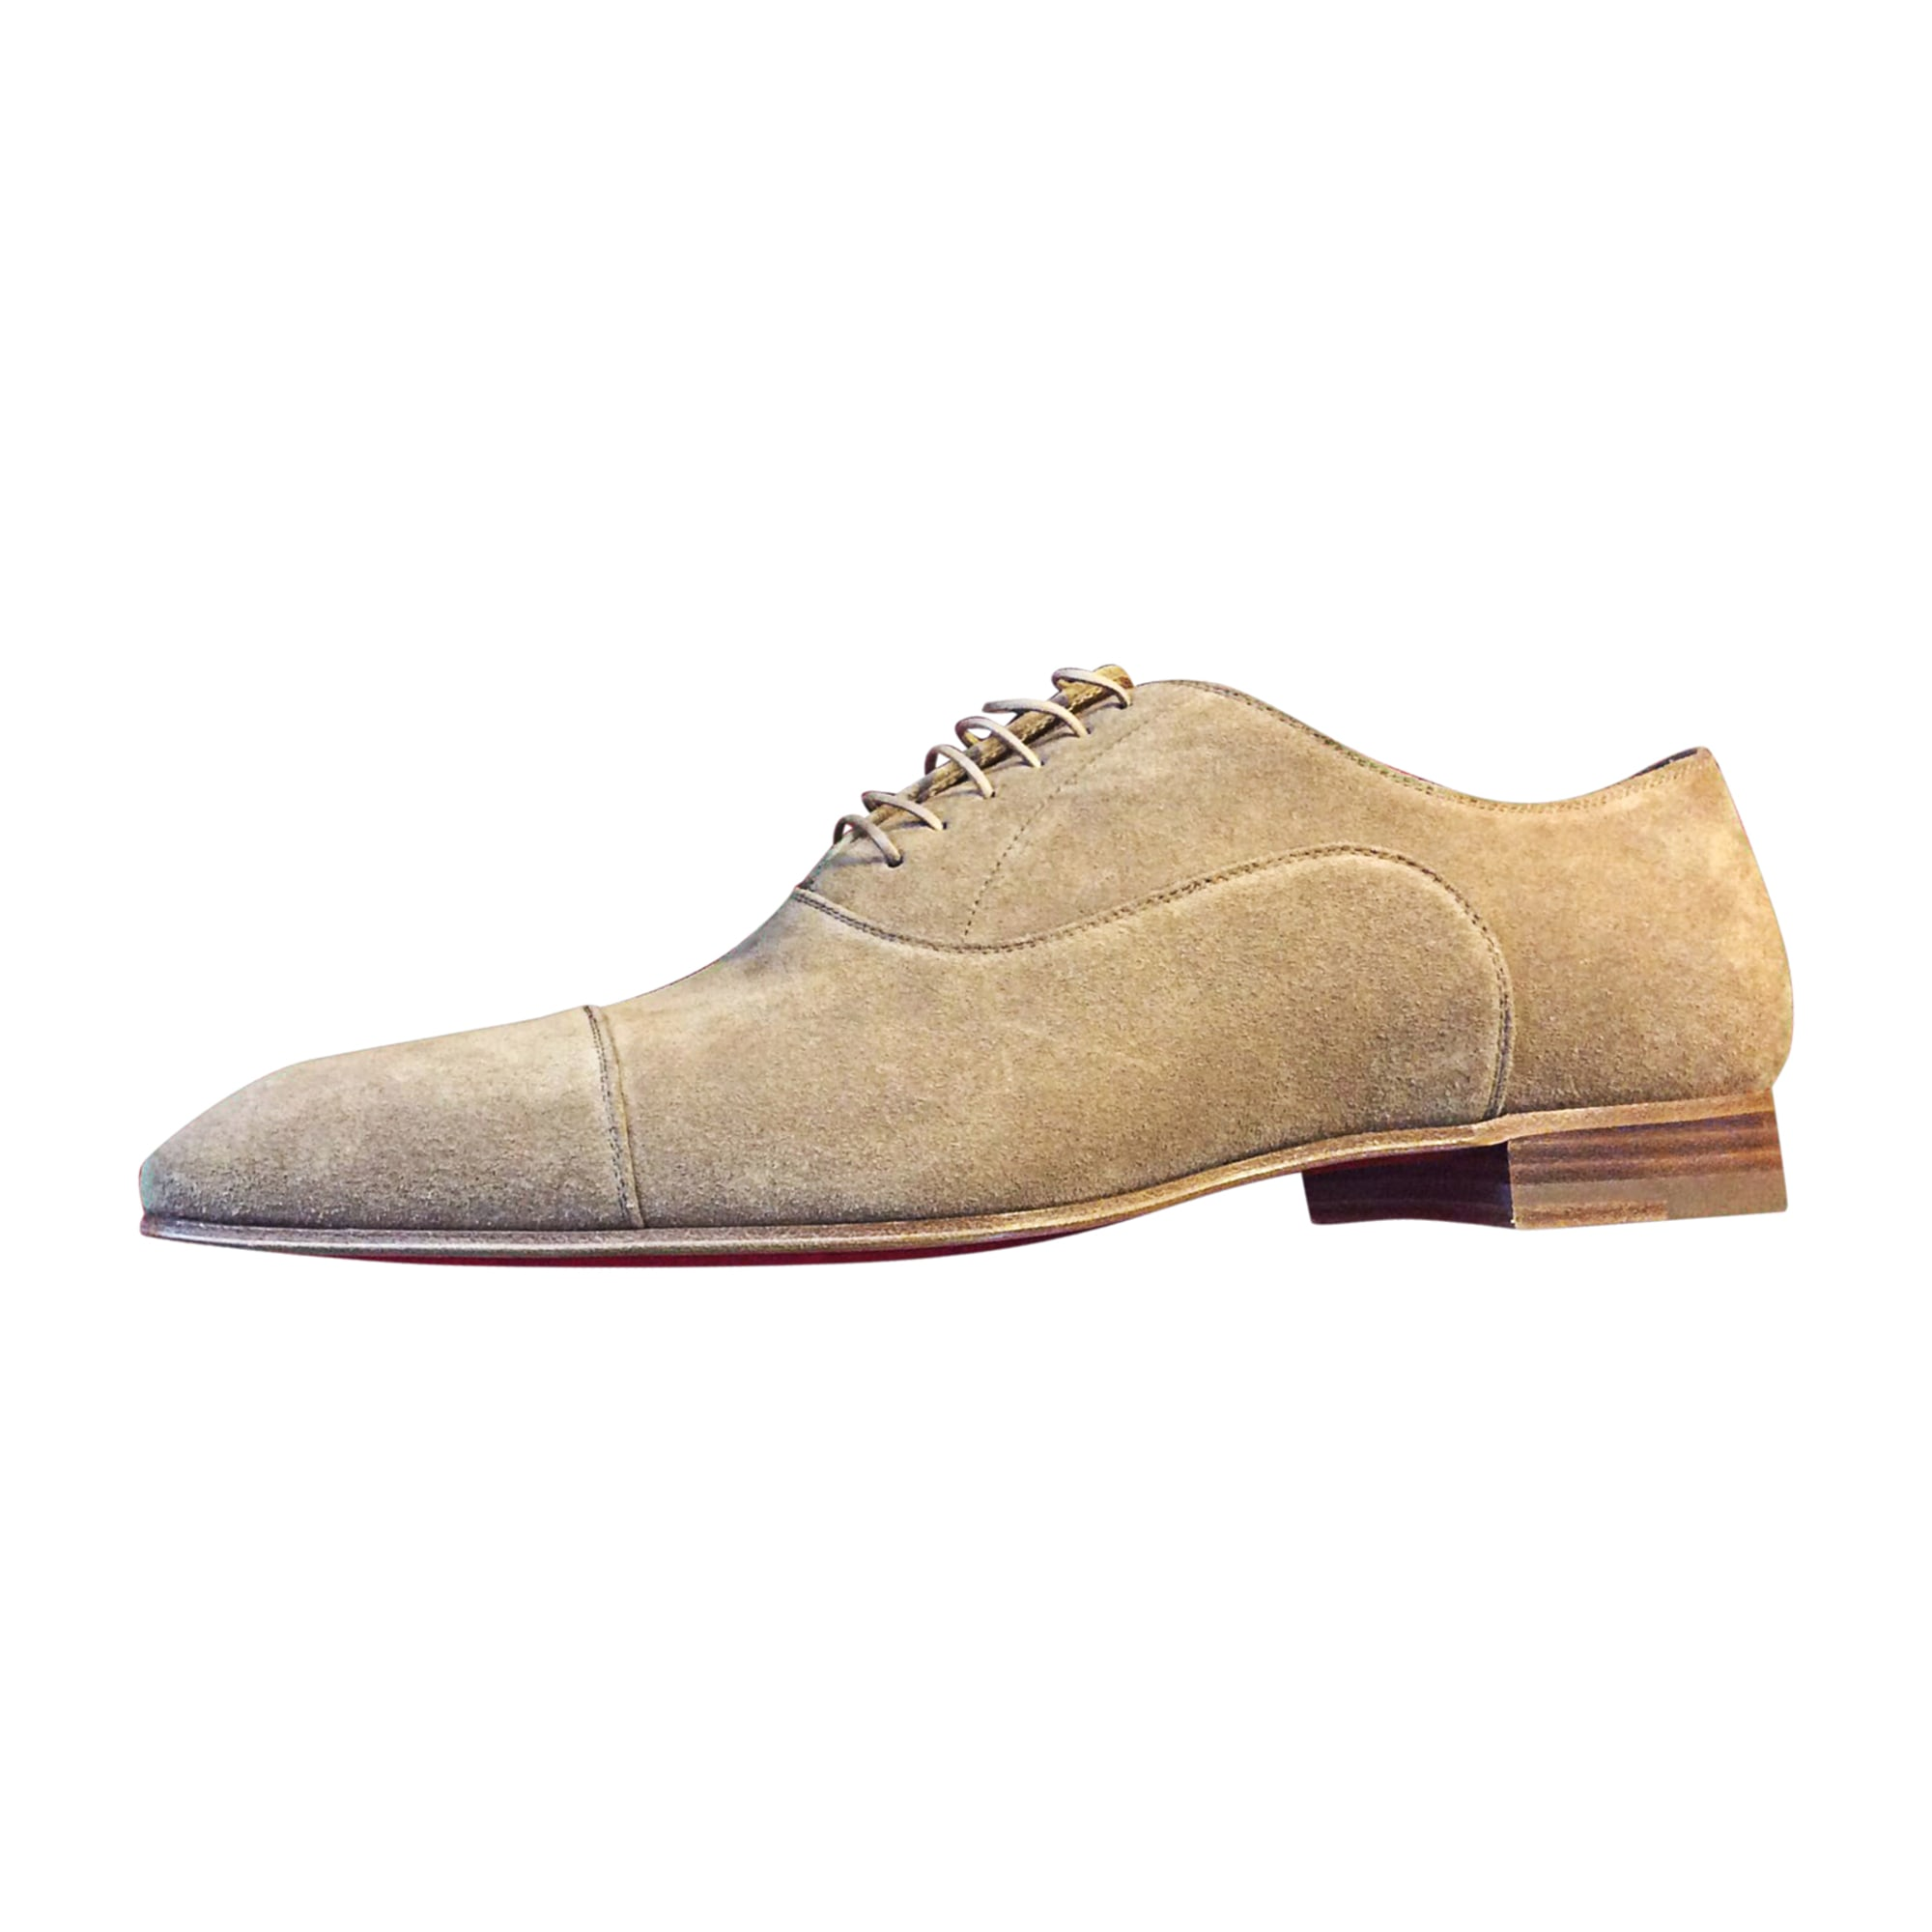 Chaussures à lacets CHRISTIAN LOUBOUTIN Beige, camel